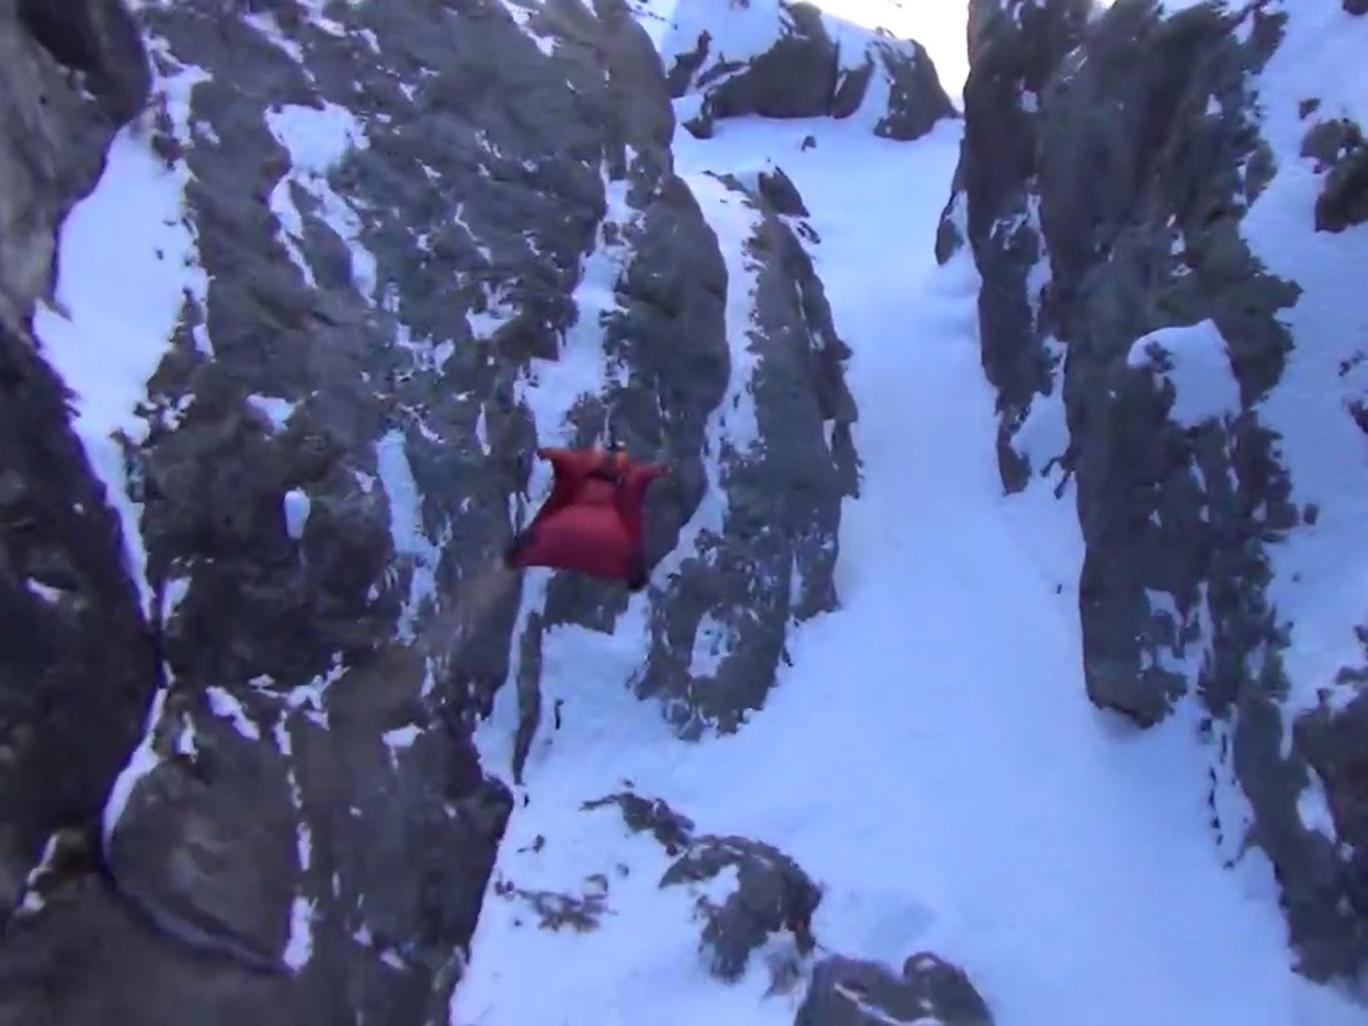 Late wingsuit pilot Brian Drake's final flight through the Alps